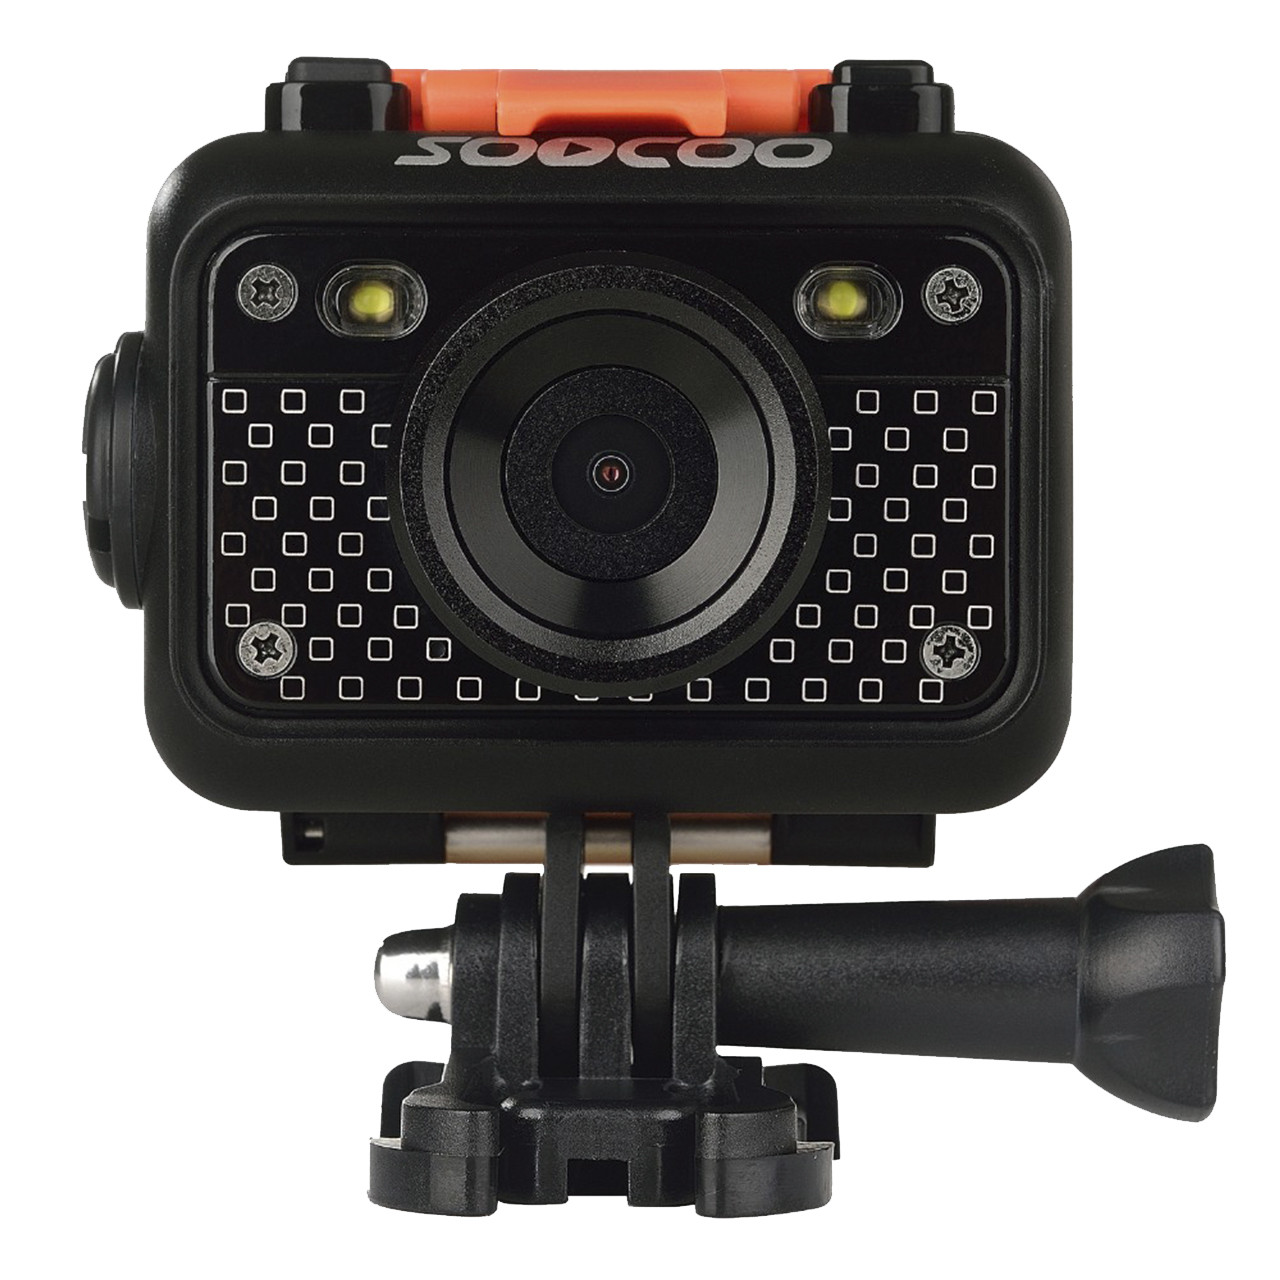 Экшн-камера SOOCOO S60 съемка 12 Mpx пульт ДУ Батарея 1050mAh Wi-Fi SOS- режим карта памяти